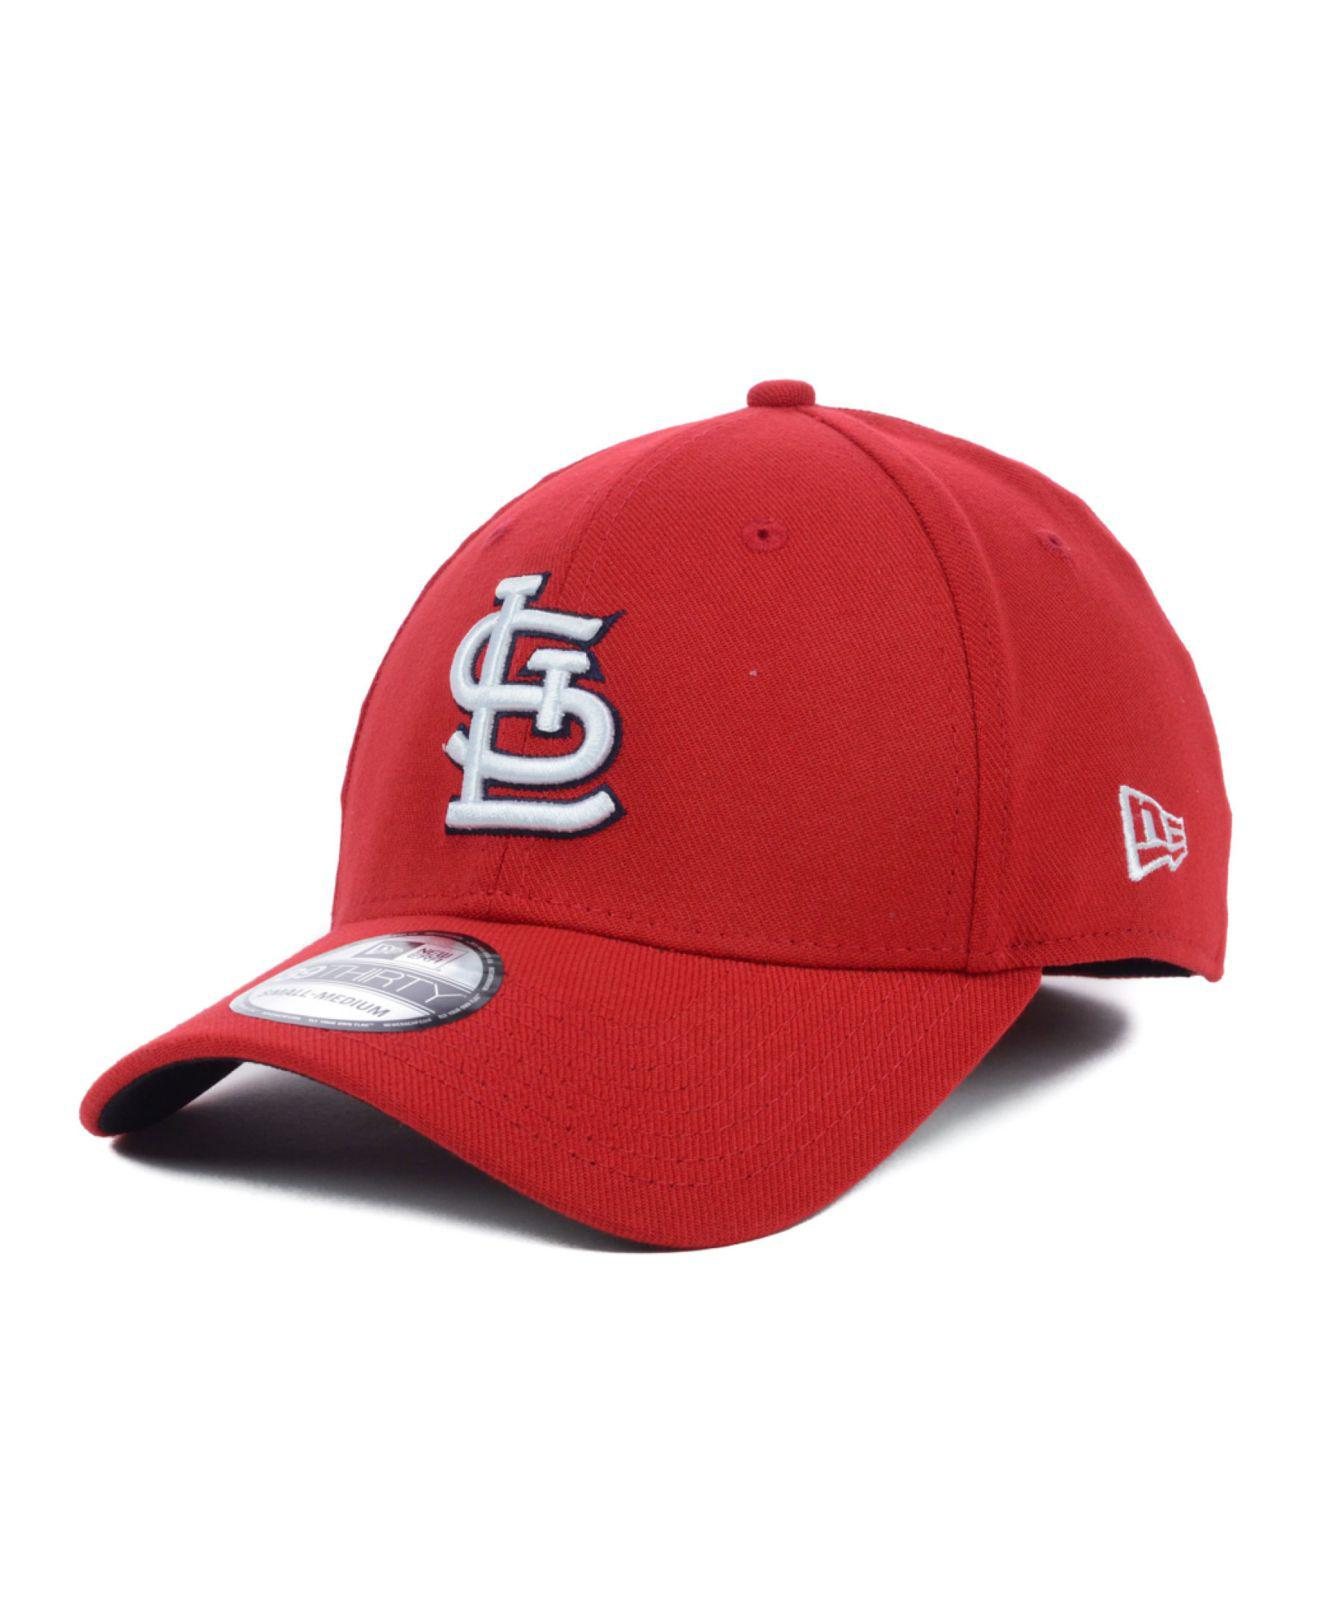 more photos 13f18 584b0 ... where to buy ktz. mens red st. louis cardinals mlb team classic 39thirty  cap